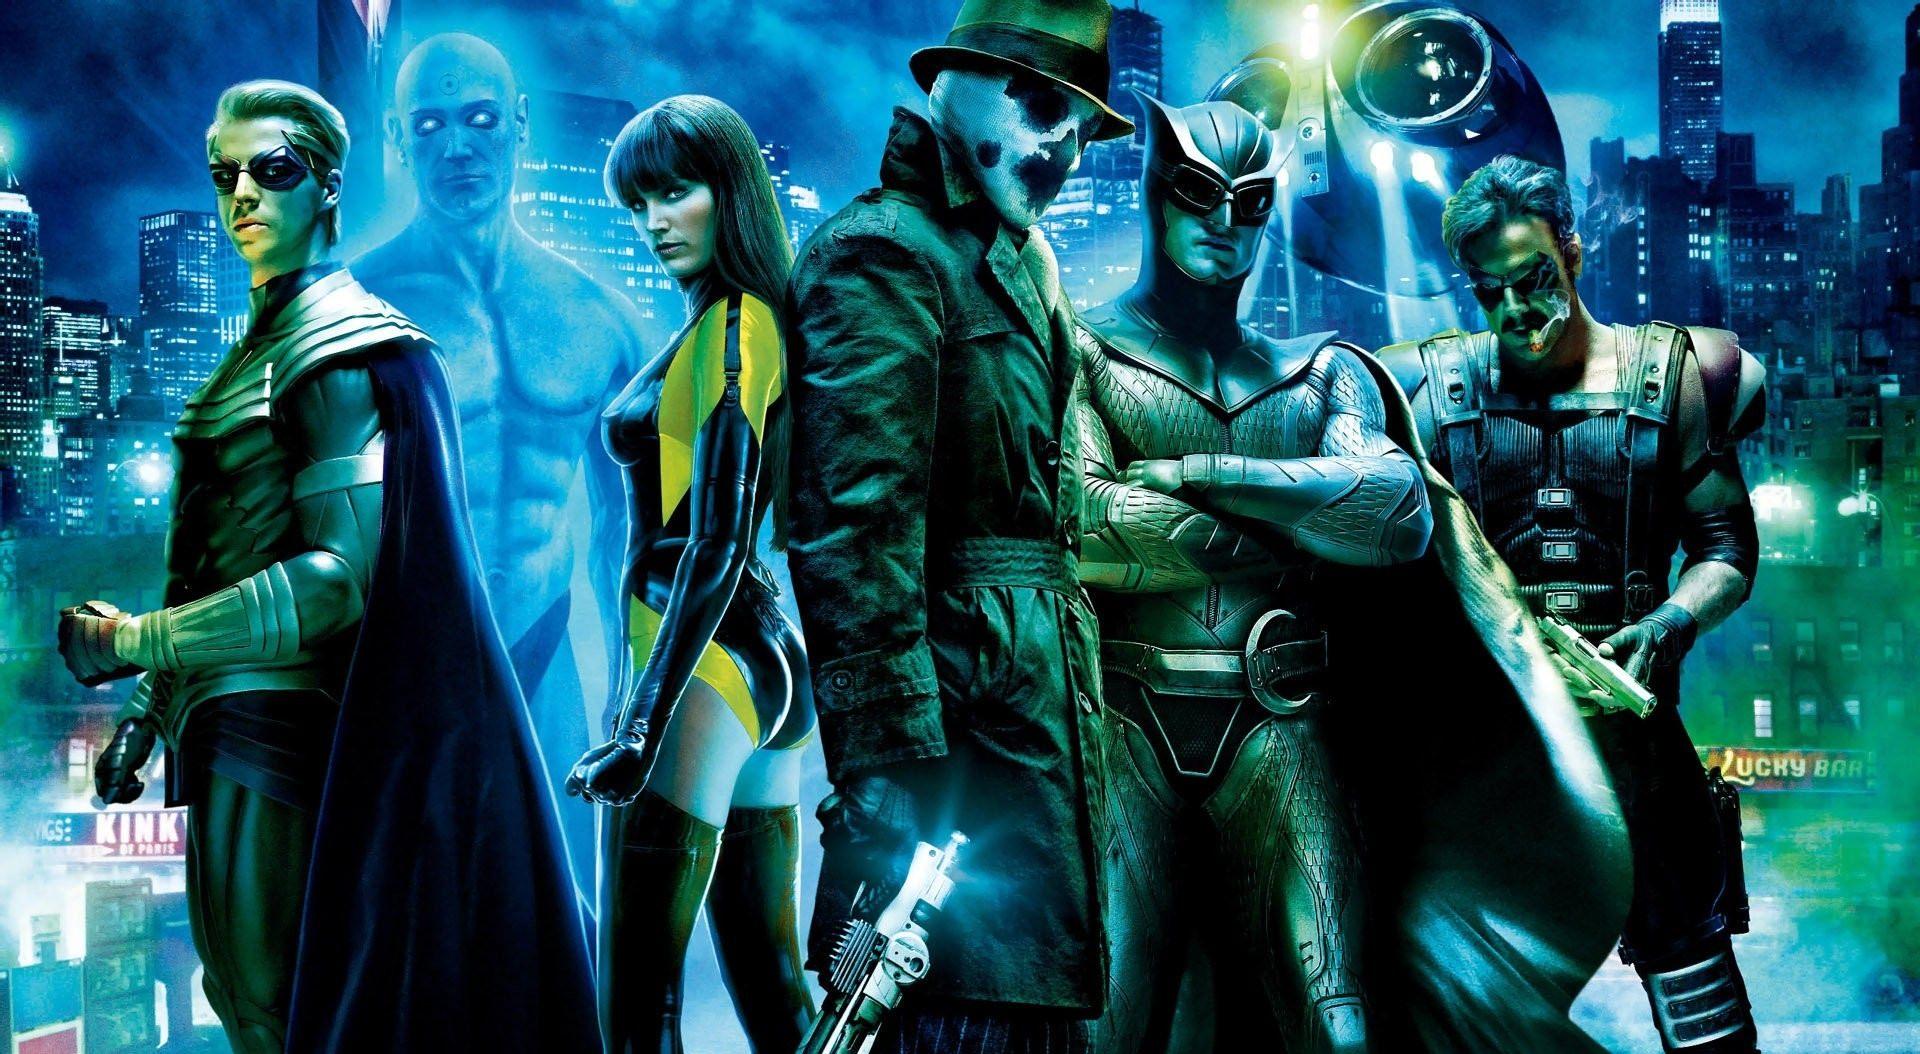 15 Best HD Superhero Movie WallpapersFreeCreatives 1920x1054